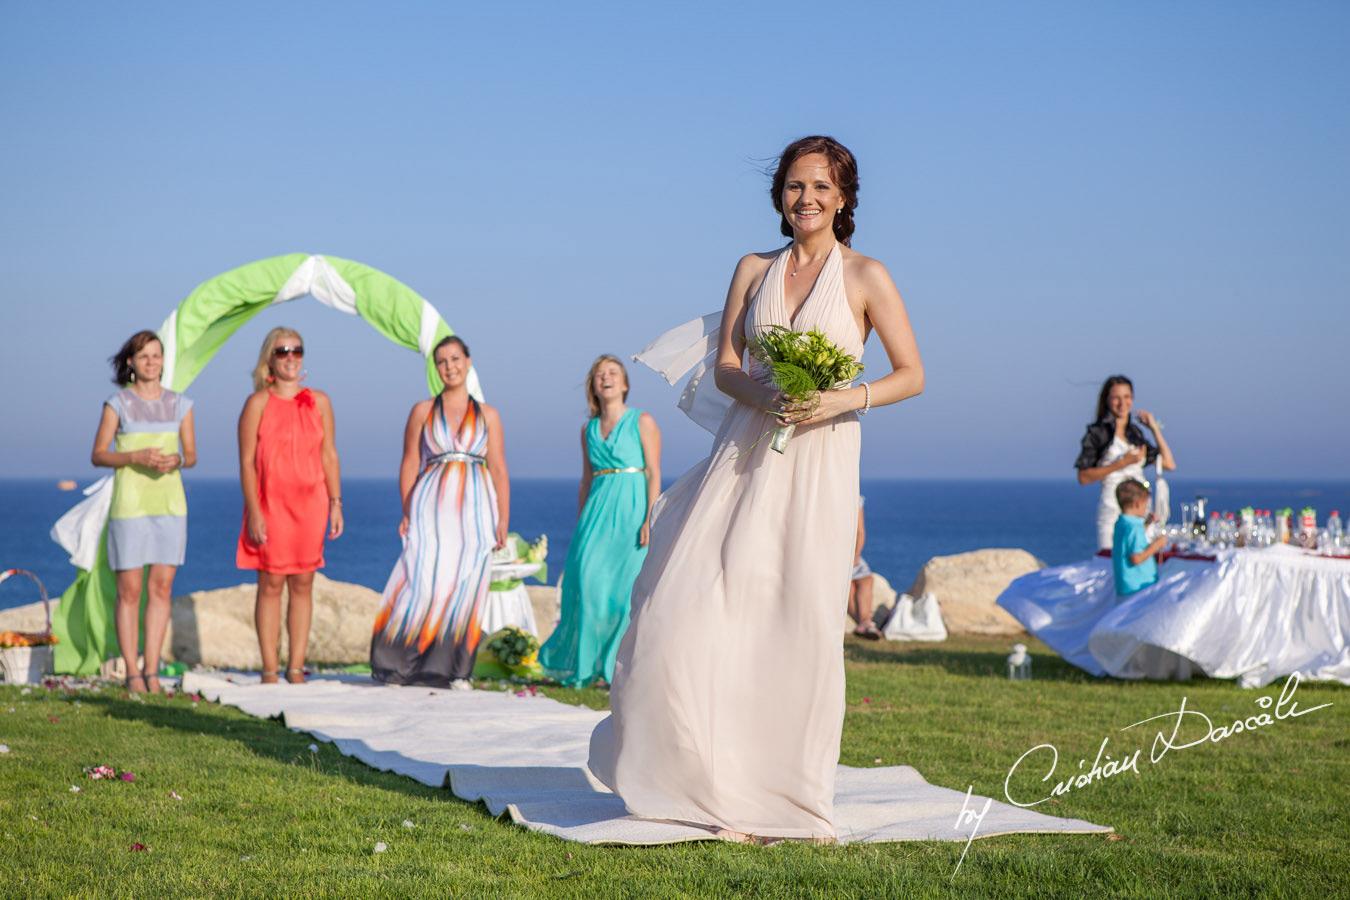 Cyprus Wedding Photography - Alex & Inga. Cyprus Photographer: Cristian Dascalu